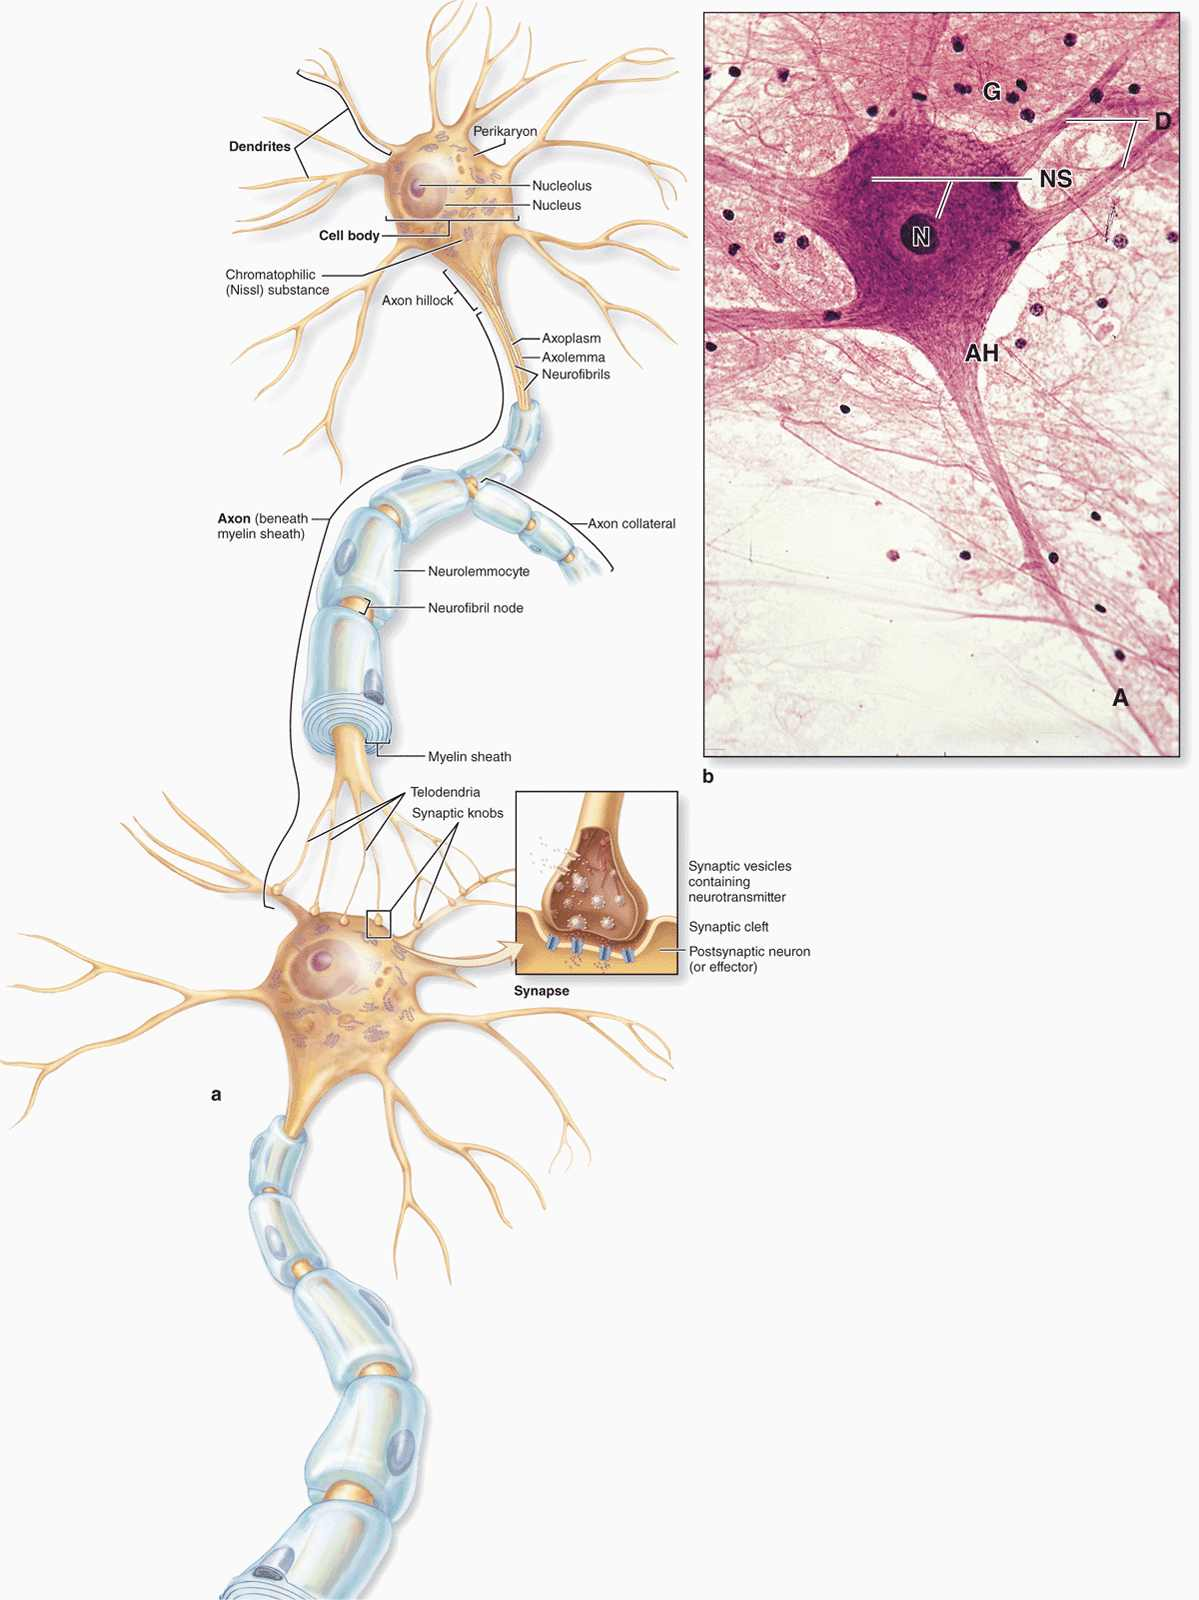 basic neuron diagram beetle wiring 1972 nerve tissue and the nervous system basicmedical key